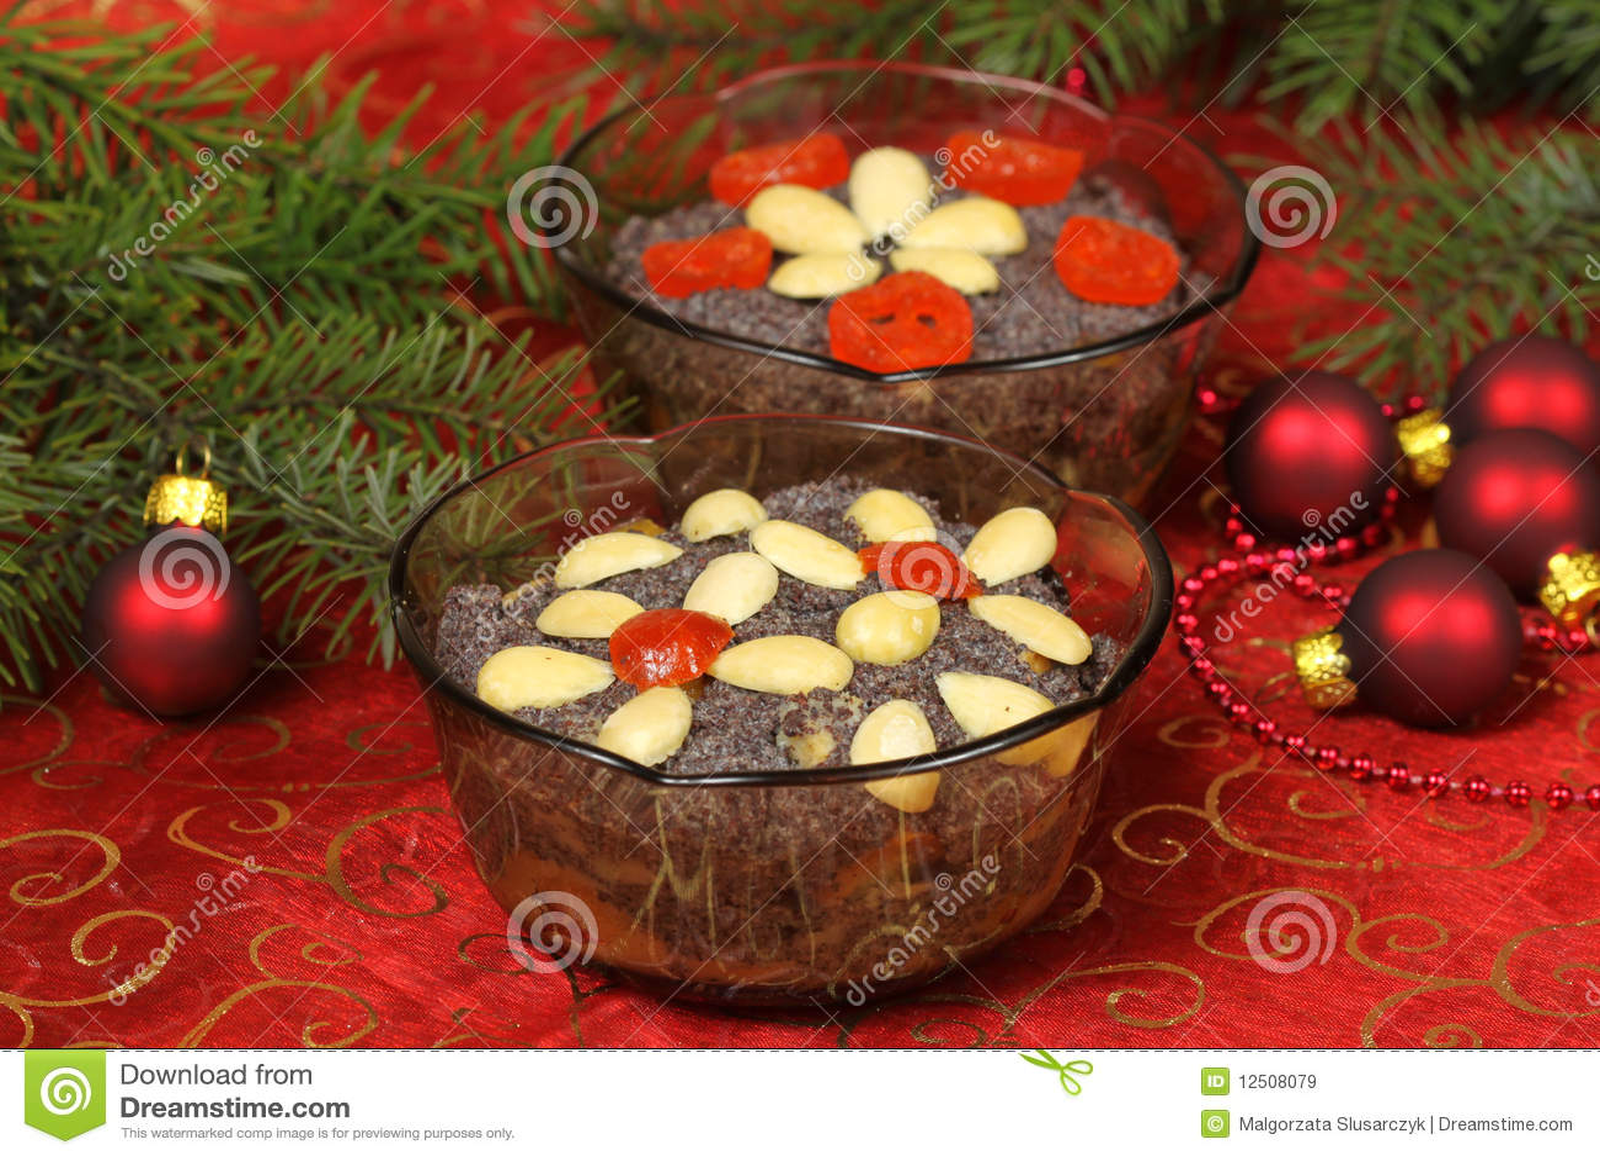 Traditional Christmas Desserts.Polish Christmas Desserts Makowki Stock Image Image Of